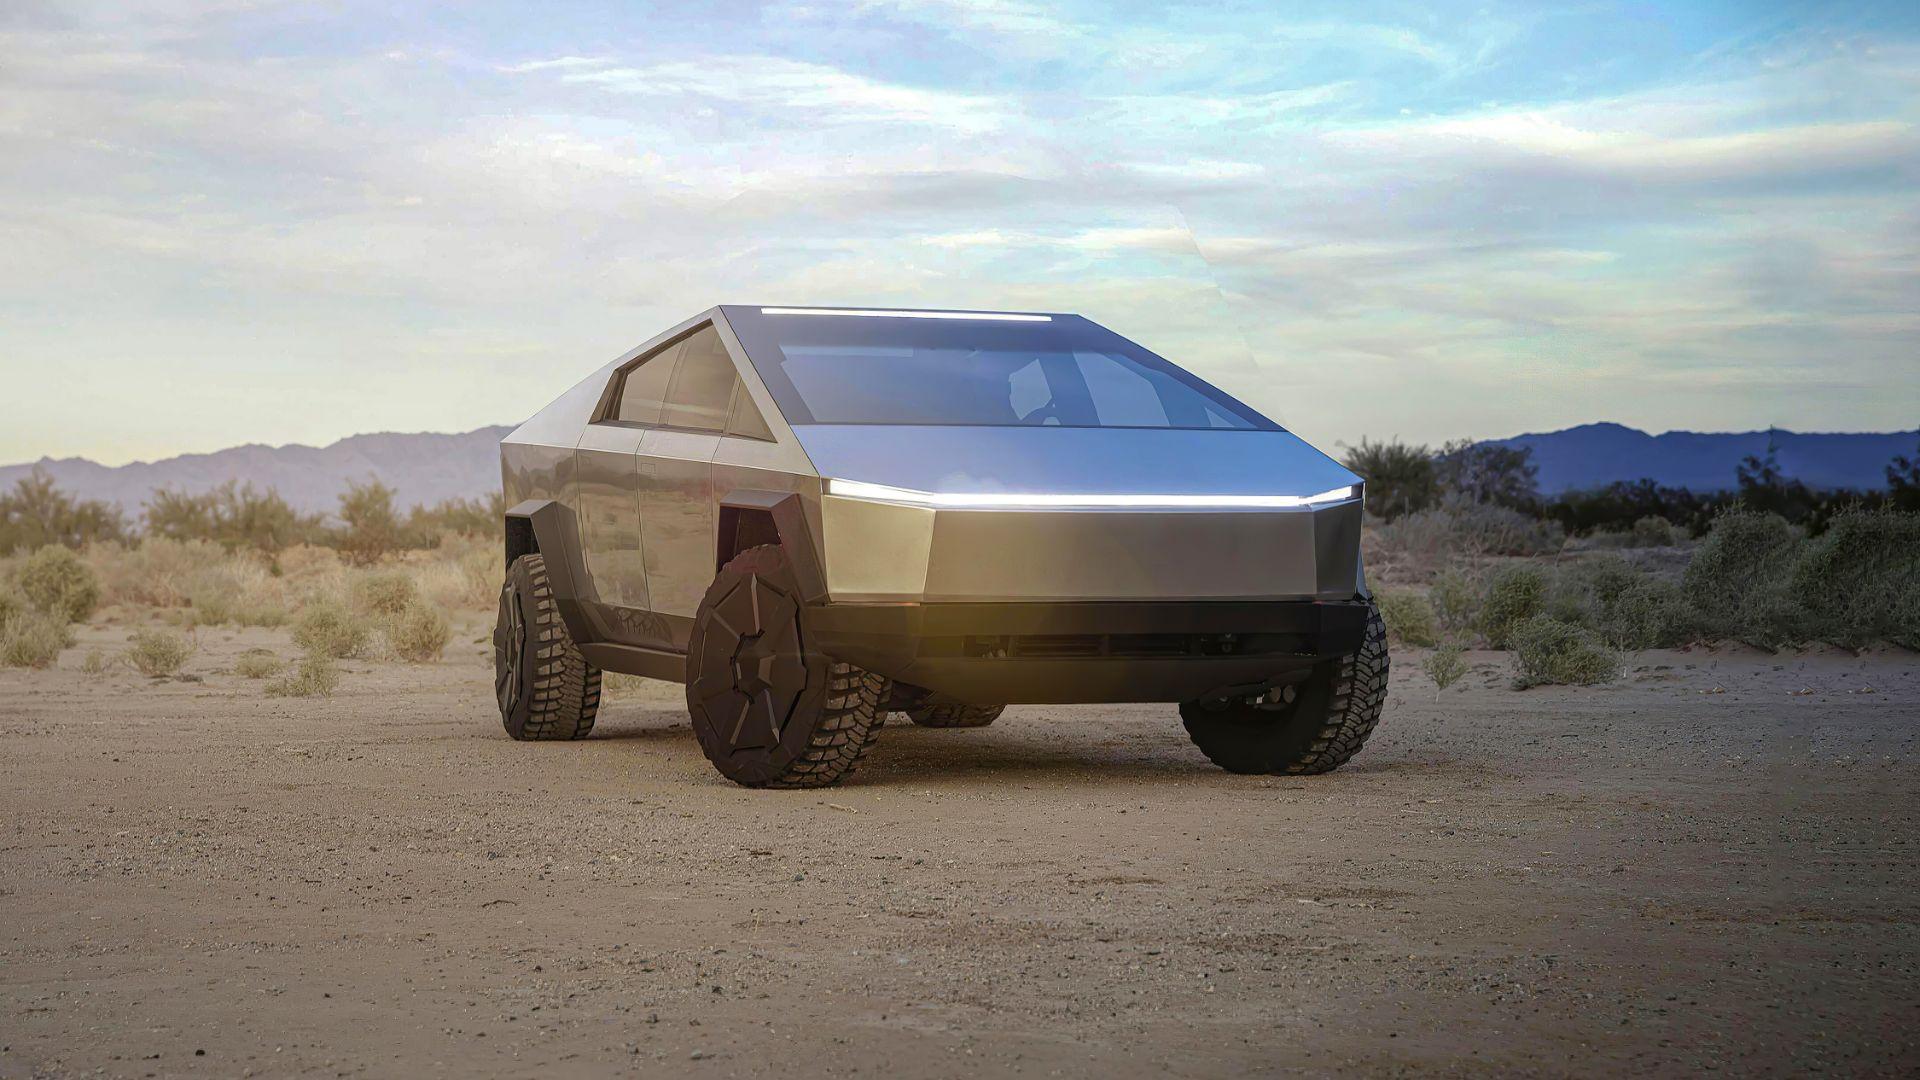 Tesla Cybertruck wouldn't be legal in Europe